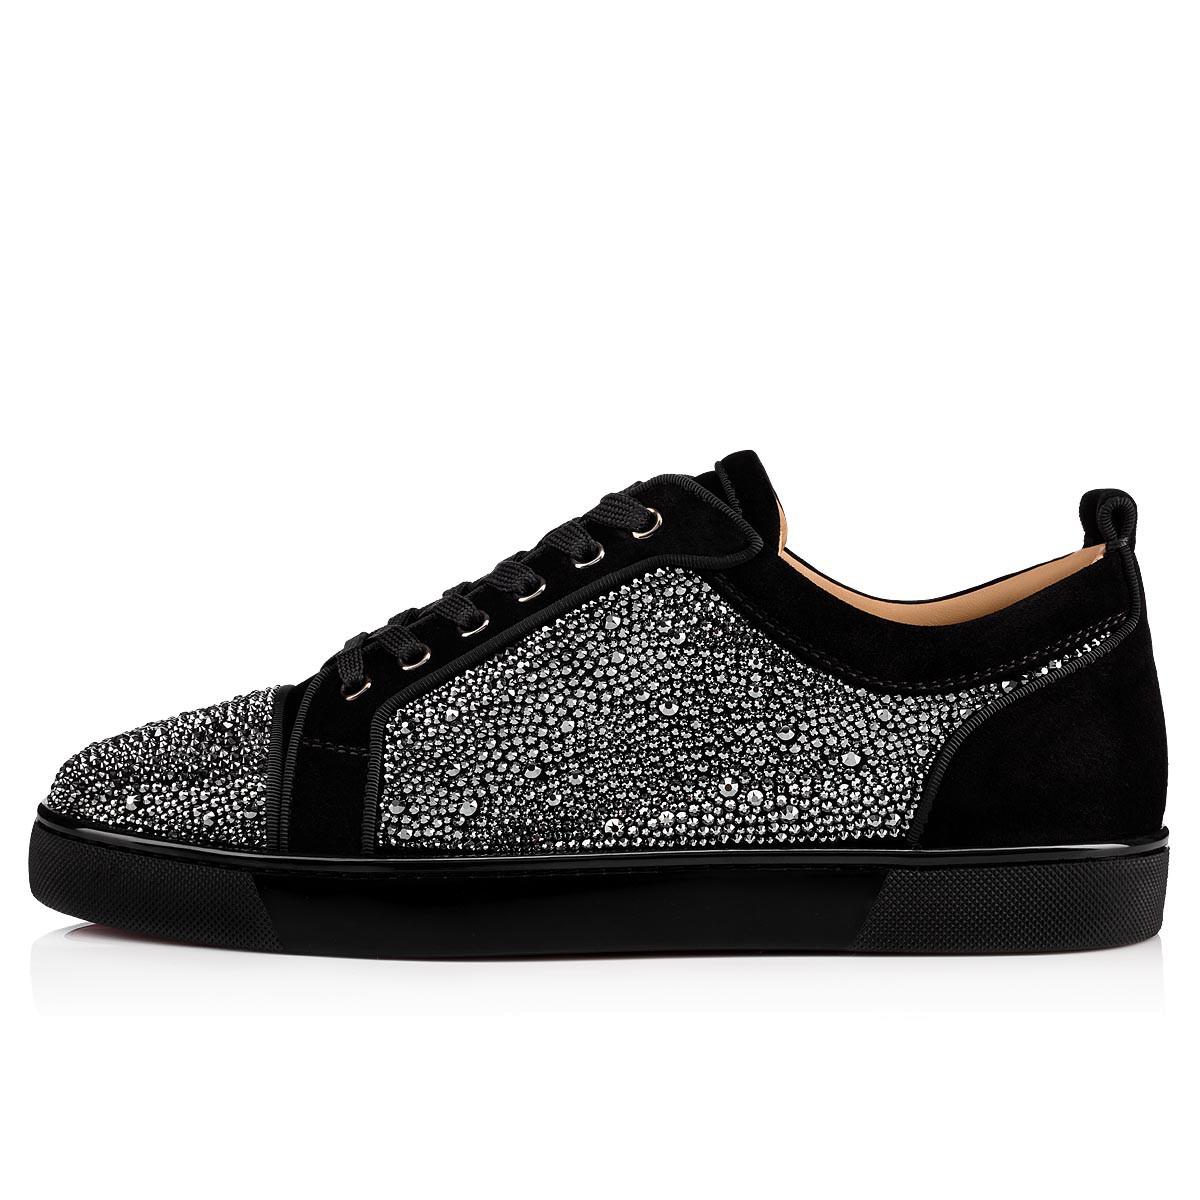 Men Shoes - Louis Junior Strass - Christian Louboutin